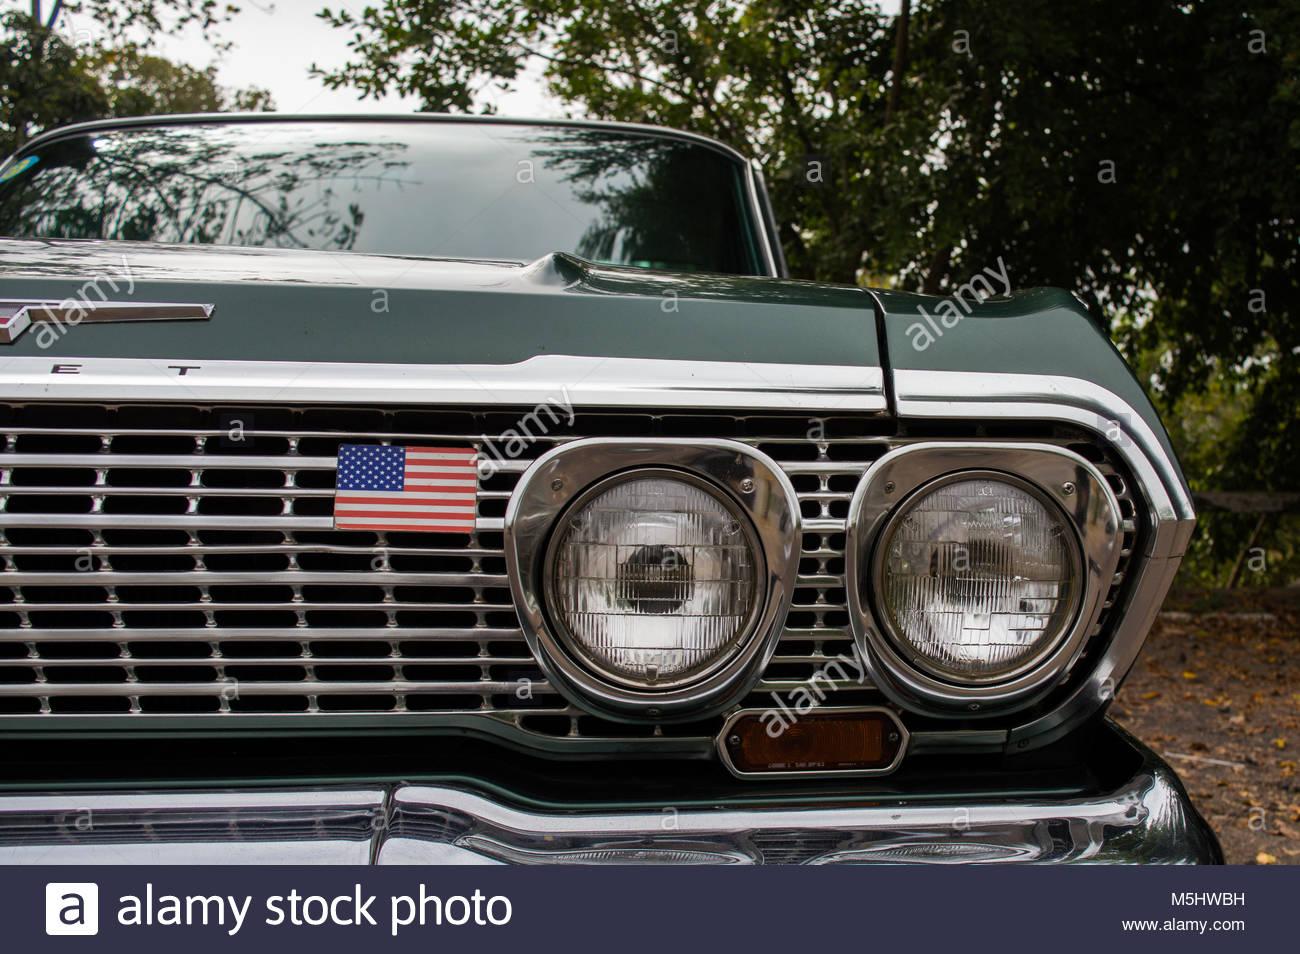 Old Car Headlights : Ford maverick stock photos images